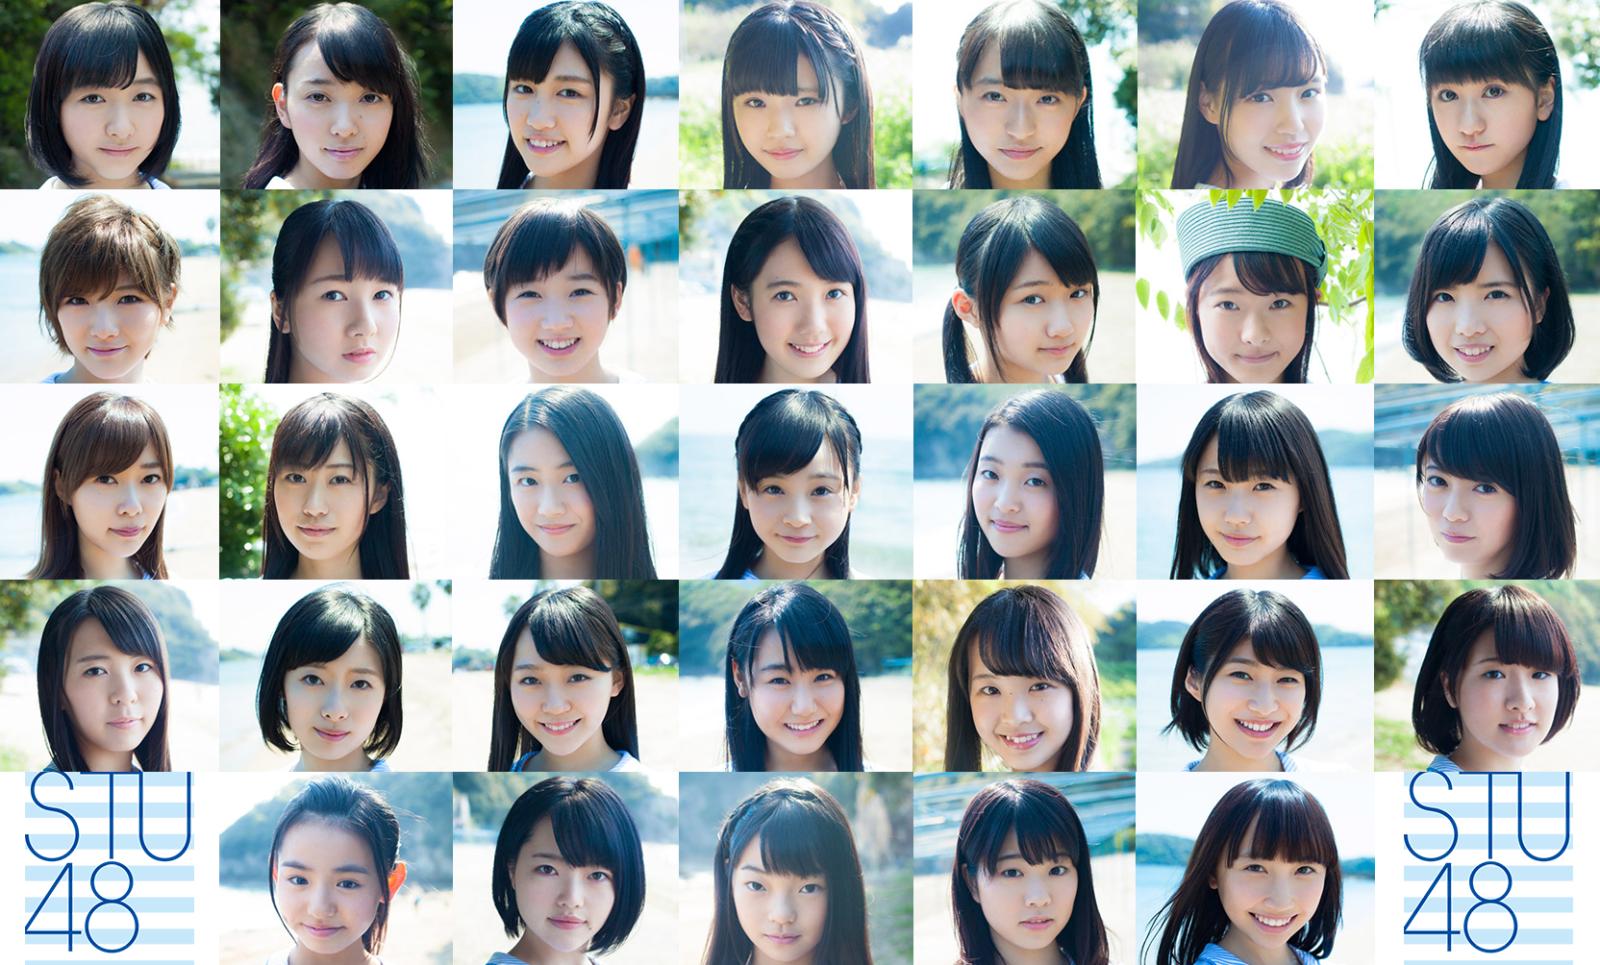 AKB48グループ内最速!STU48、初お披露目から約6ヶ月でメジャーデビュー決定サムネイル画像